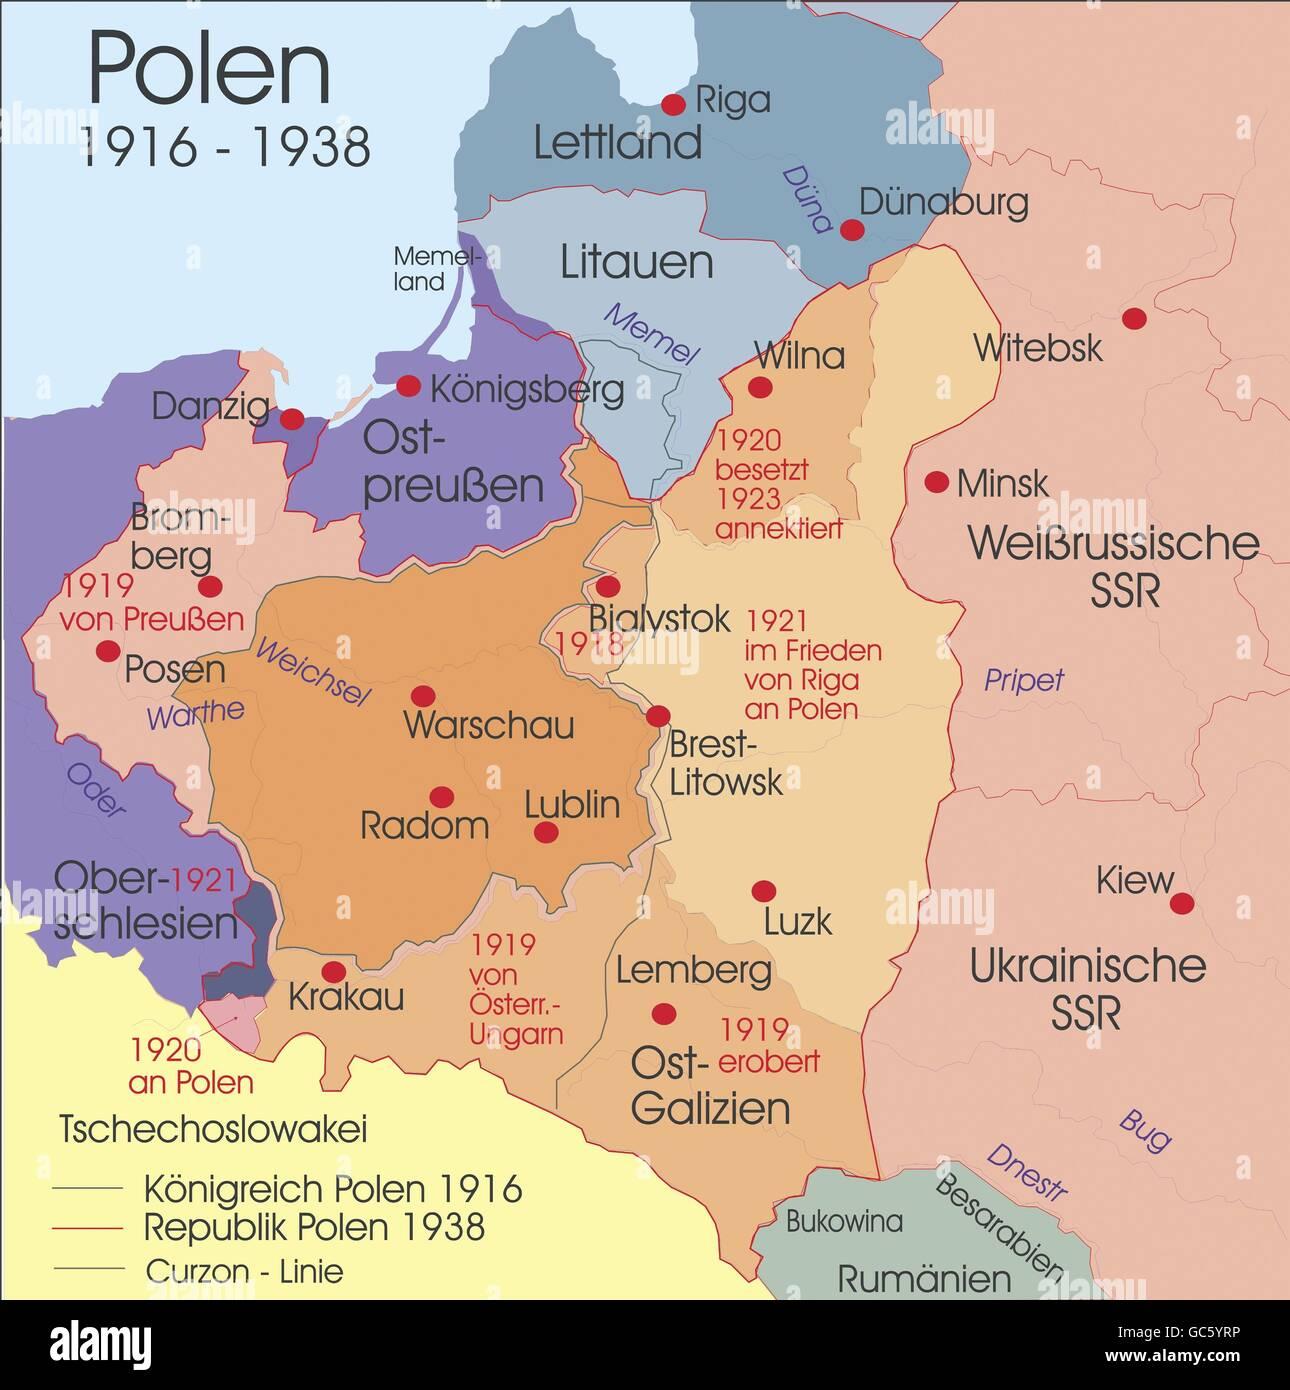 Galicia Eastern Europe Map on turkey eastern europe map, galicia eastern europe flag, serbia eastern europe map, italy eastern europe map, bavaria germany on europe map, poland and eastern europe map, latvia eastern europe map, lithuania eastern europe map, georgia eastern europe map, moravia eastern europe map, russia eastern europe map,